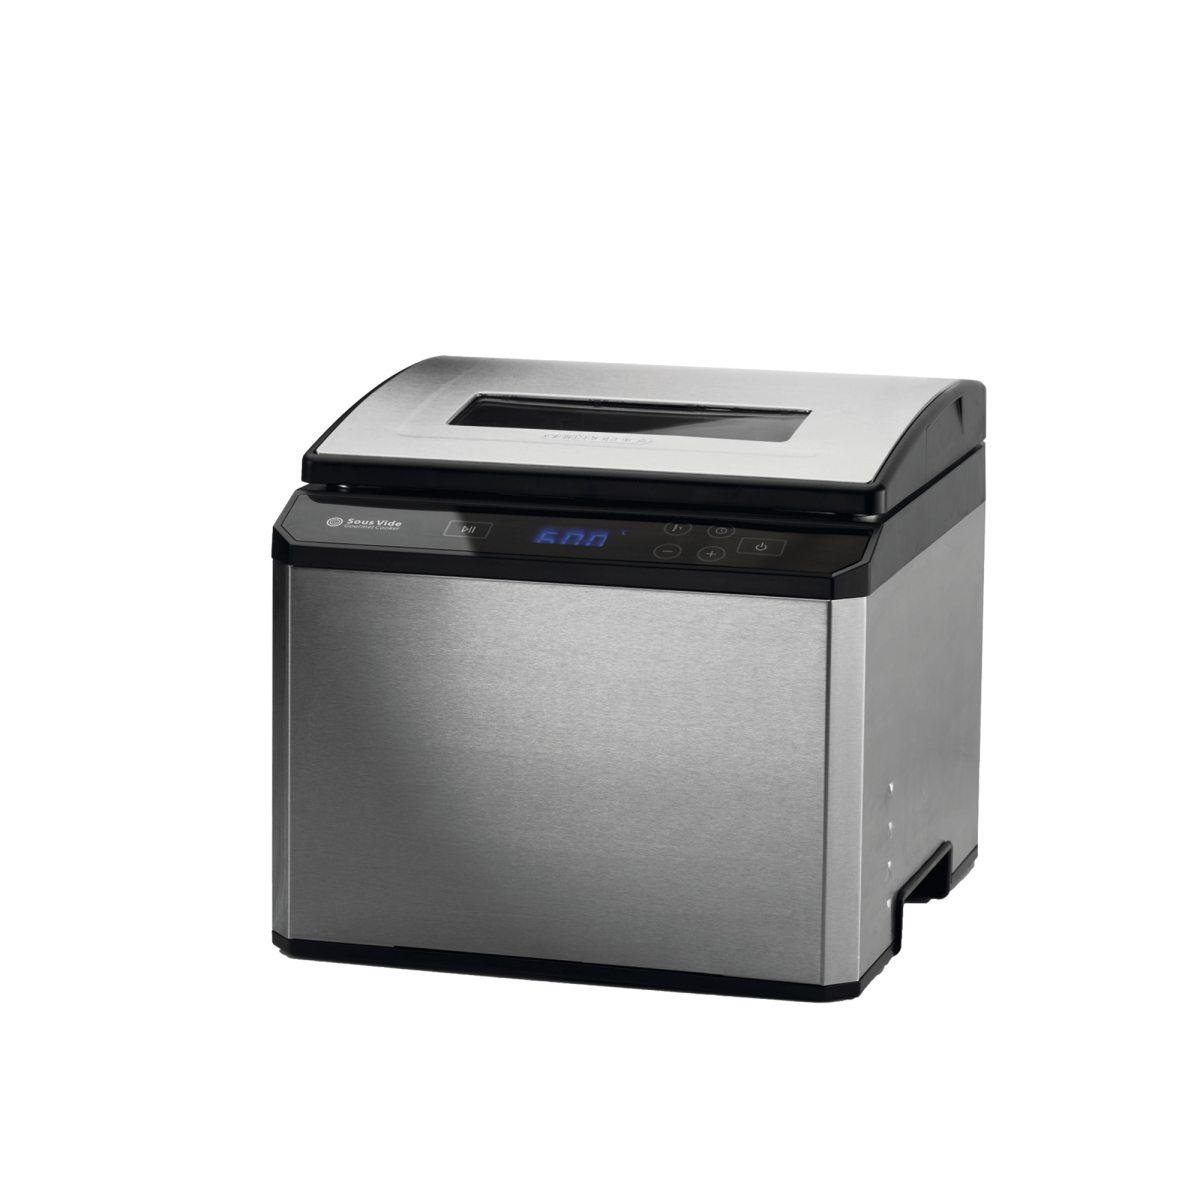 Gourmet Cooker- 2 Burner finns på PricePi.com. : droppskydd diskmaskin : Inredning